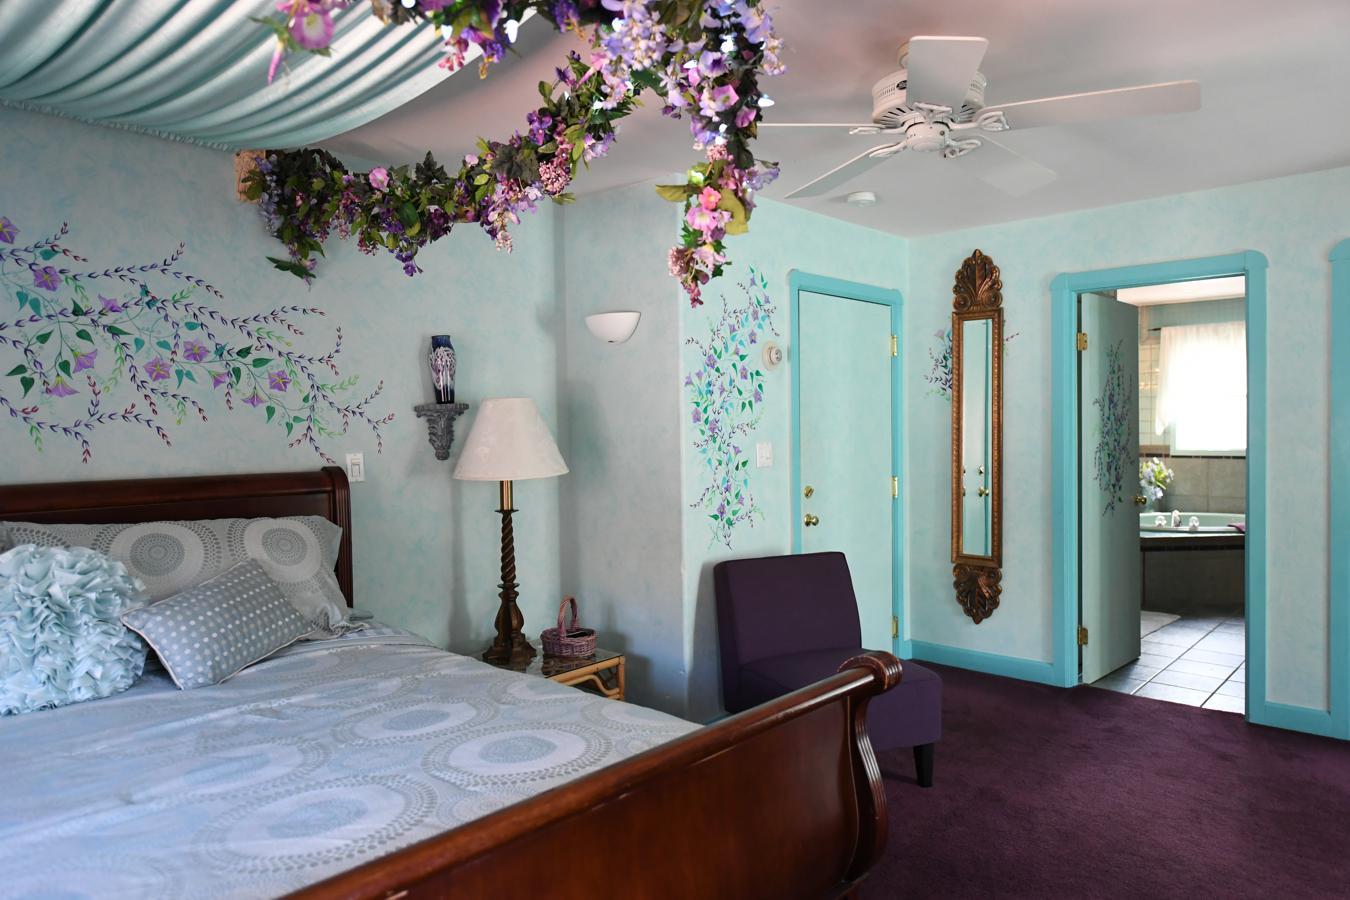 Morning Glory Suite Bed And Breakfast Blue Skies Inn